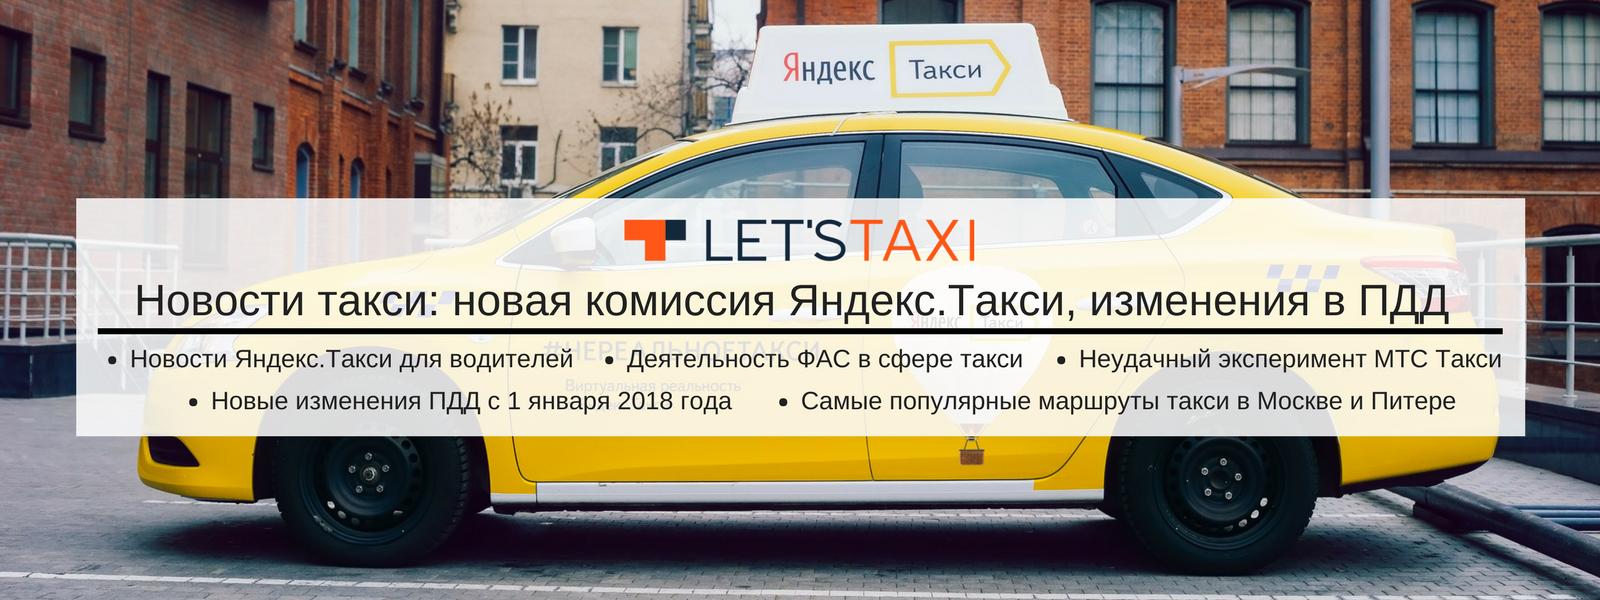 Новости такси от Let`s taxi